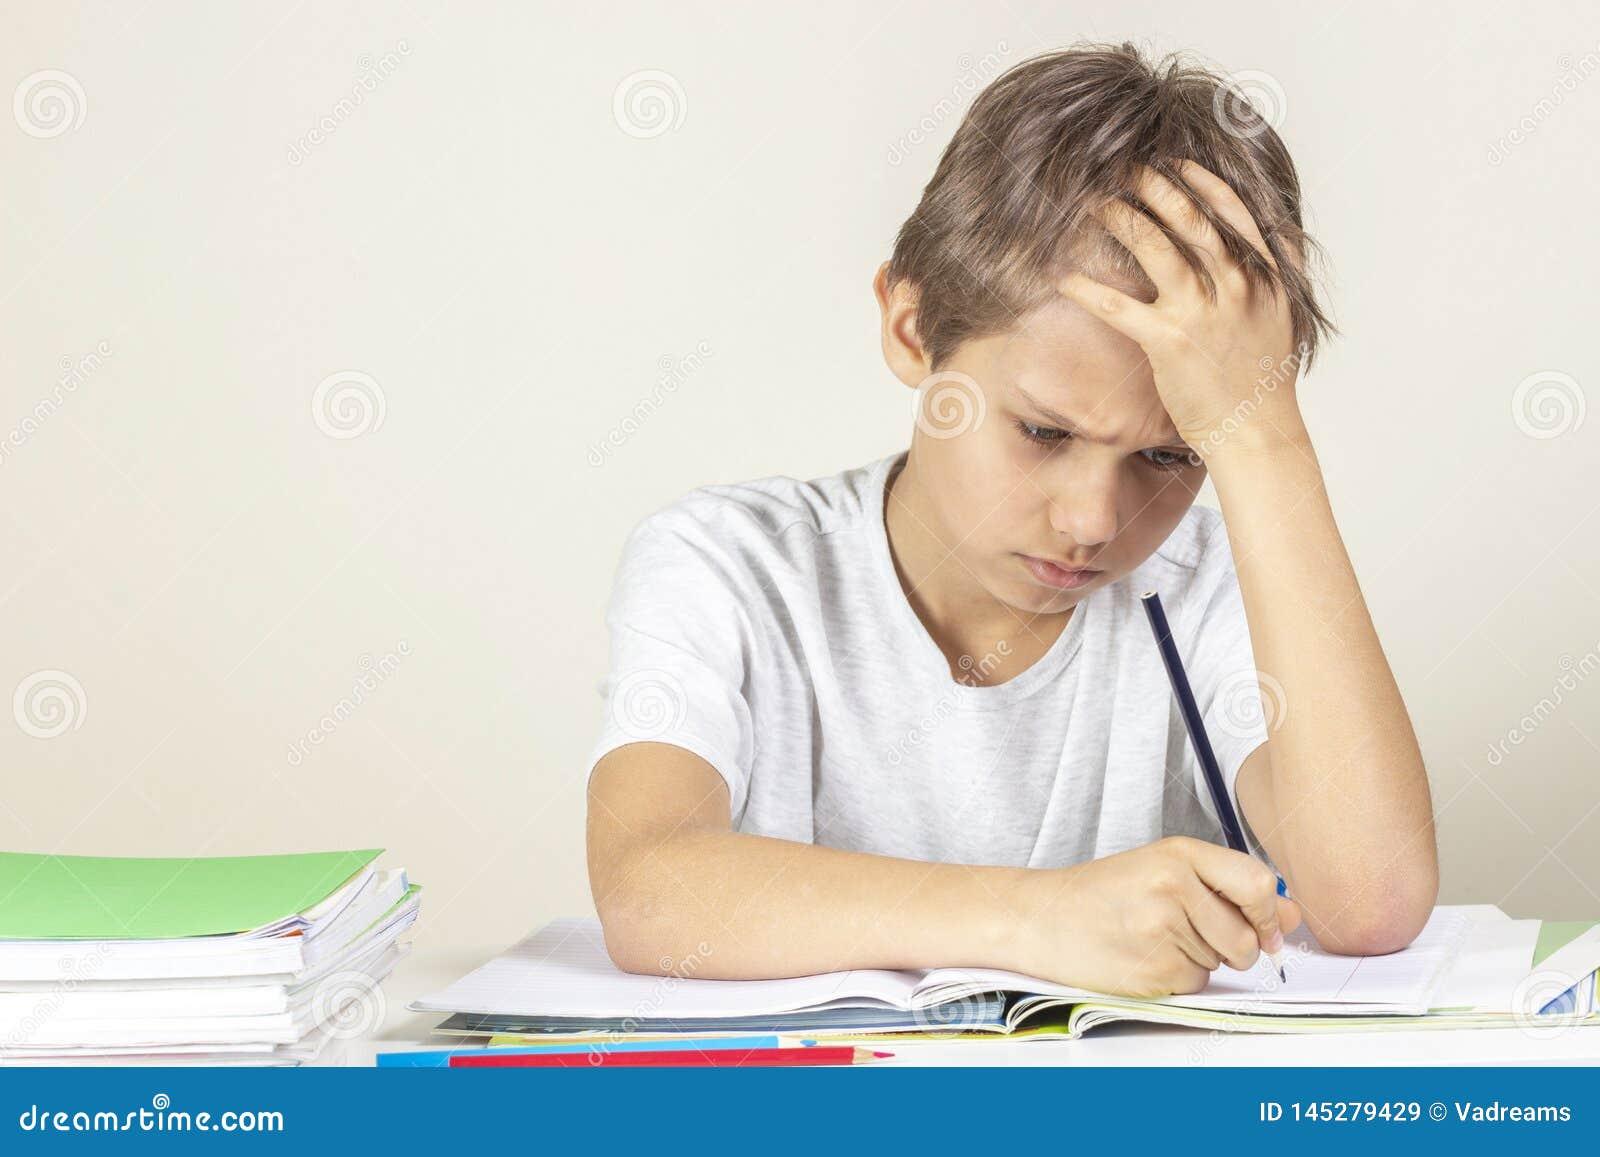 Sad boy doing homework. Education, school, learning difficulties concept